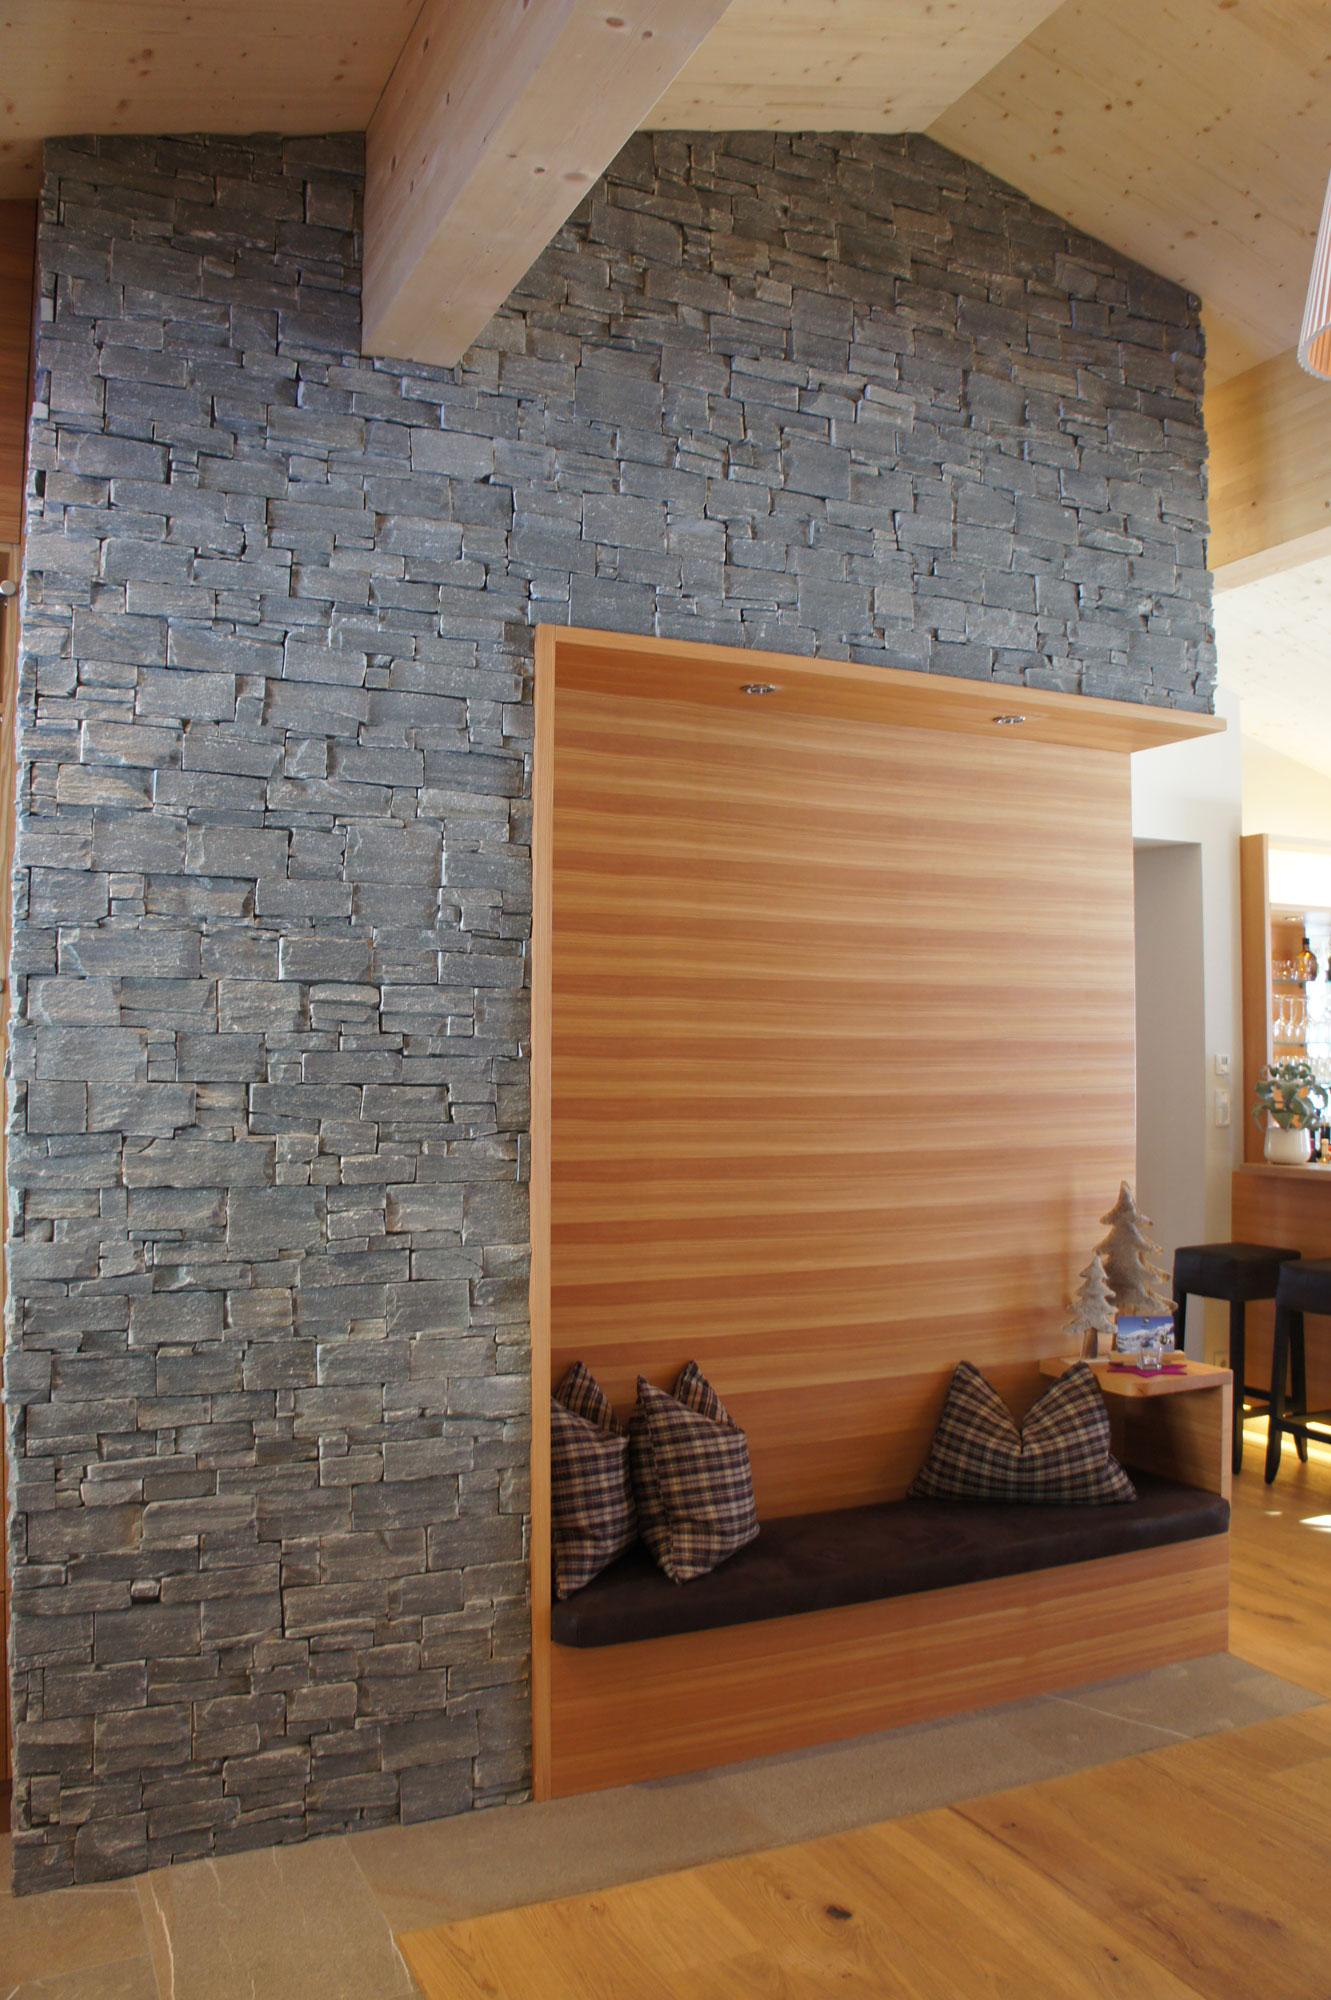 Natursteinwand Innen Of Natursteinwand Innen Ihr Traumhaus Ideen